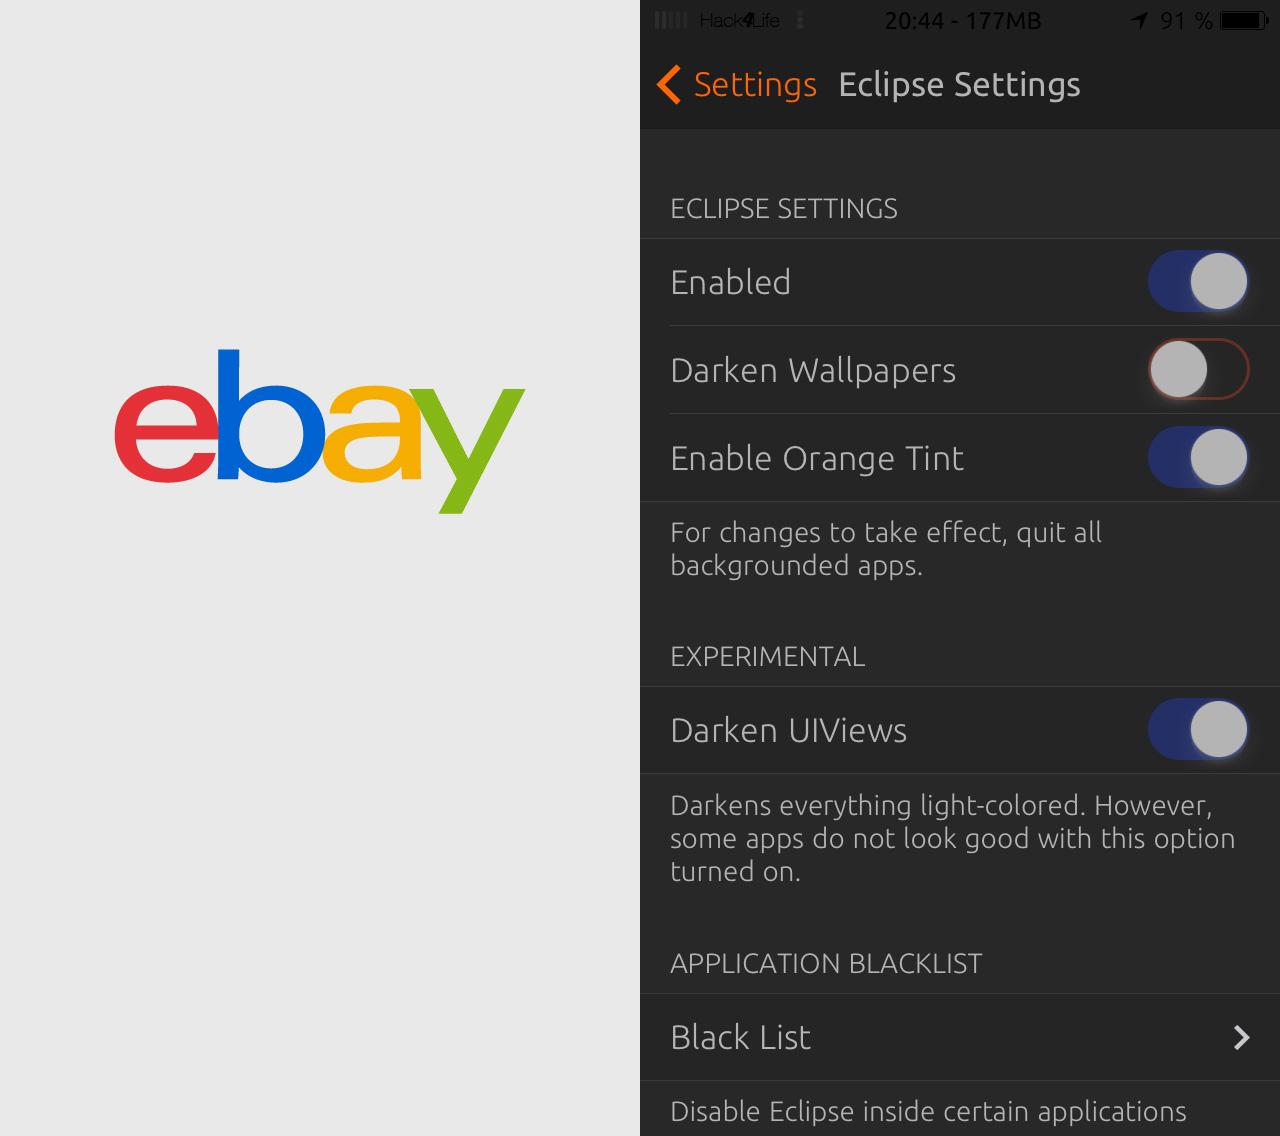 Abstürze bei der eBay Mobile App beheben, Anleitung, Review, Bericht, Test, Tweak, Cydia, Hack4Life, Fabian Geissler